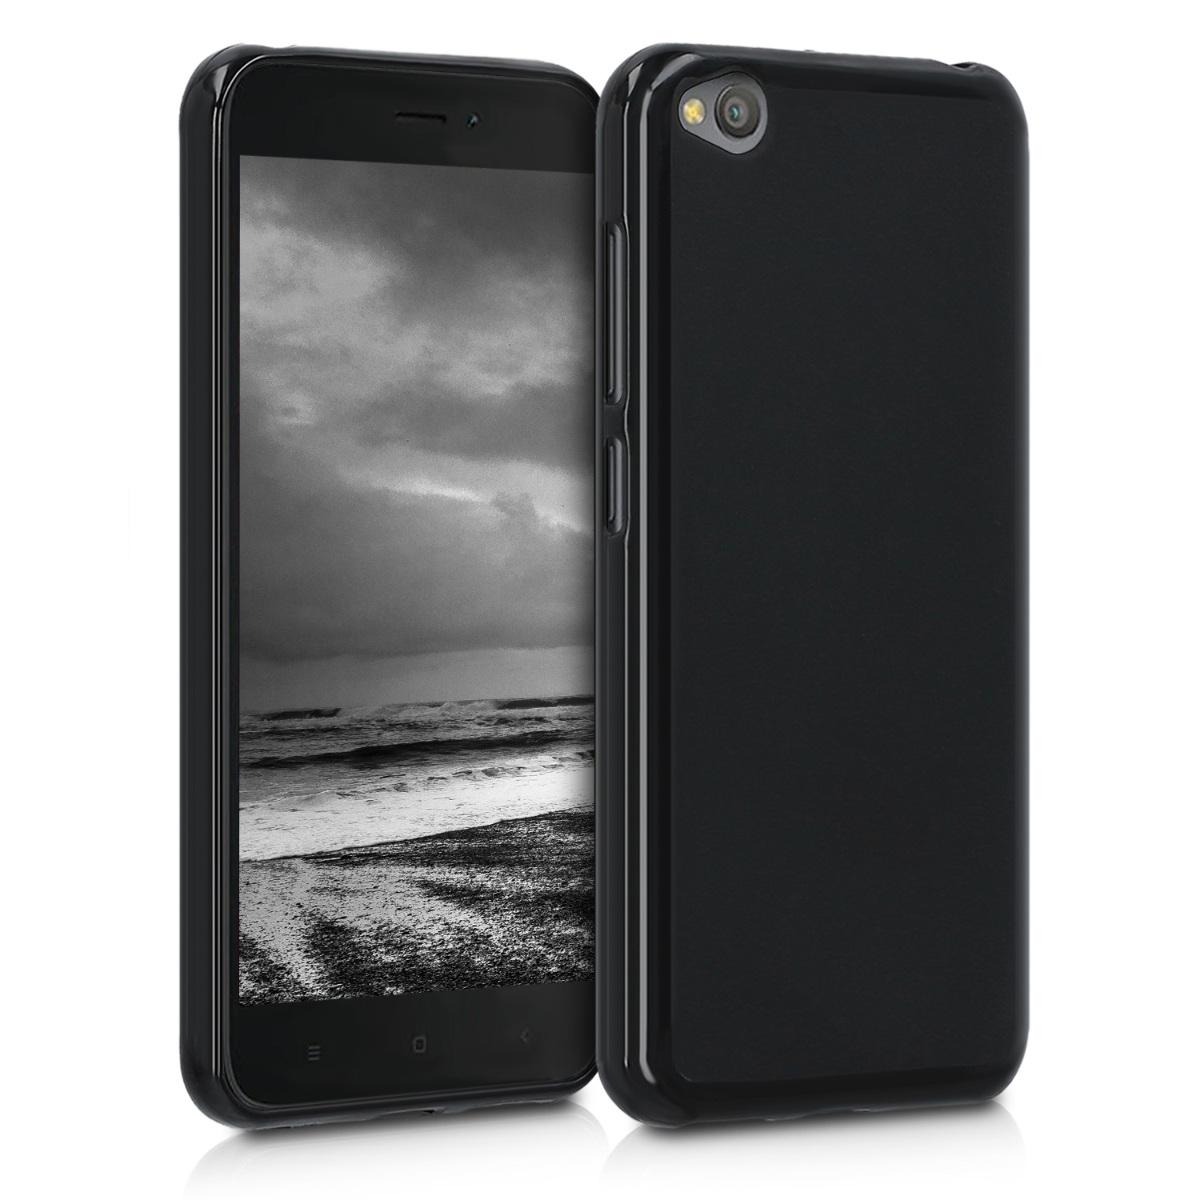 KW Θήκη Σιλικόνης Xiaomi Redmi Go - Black Matte (47712.47)